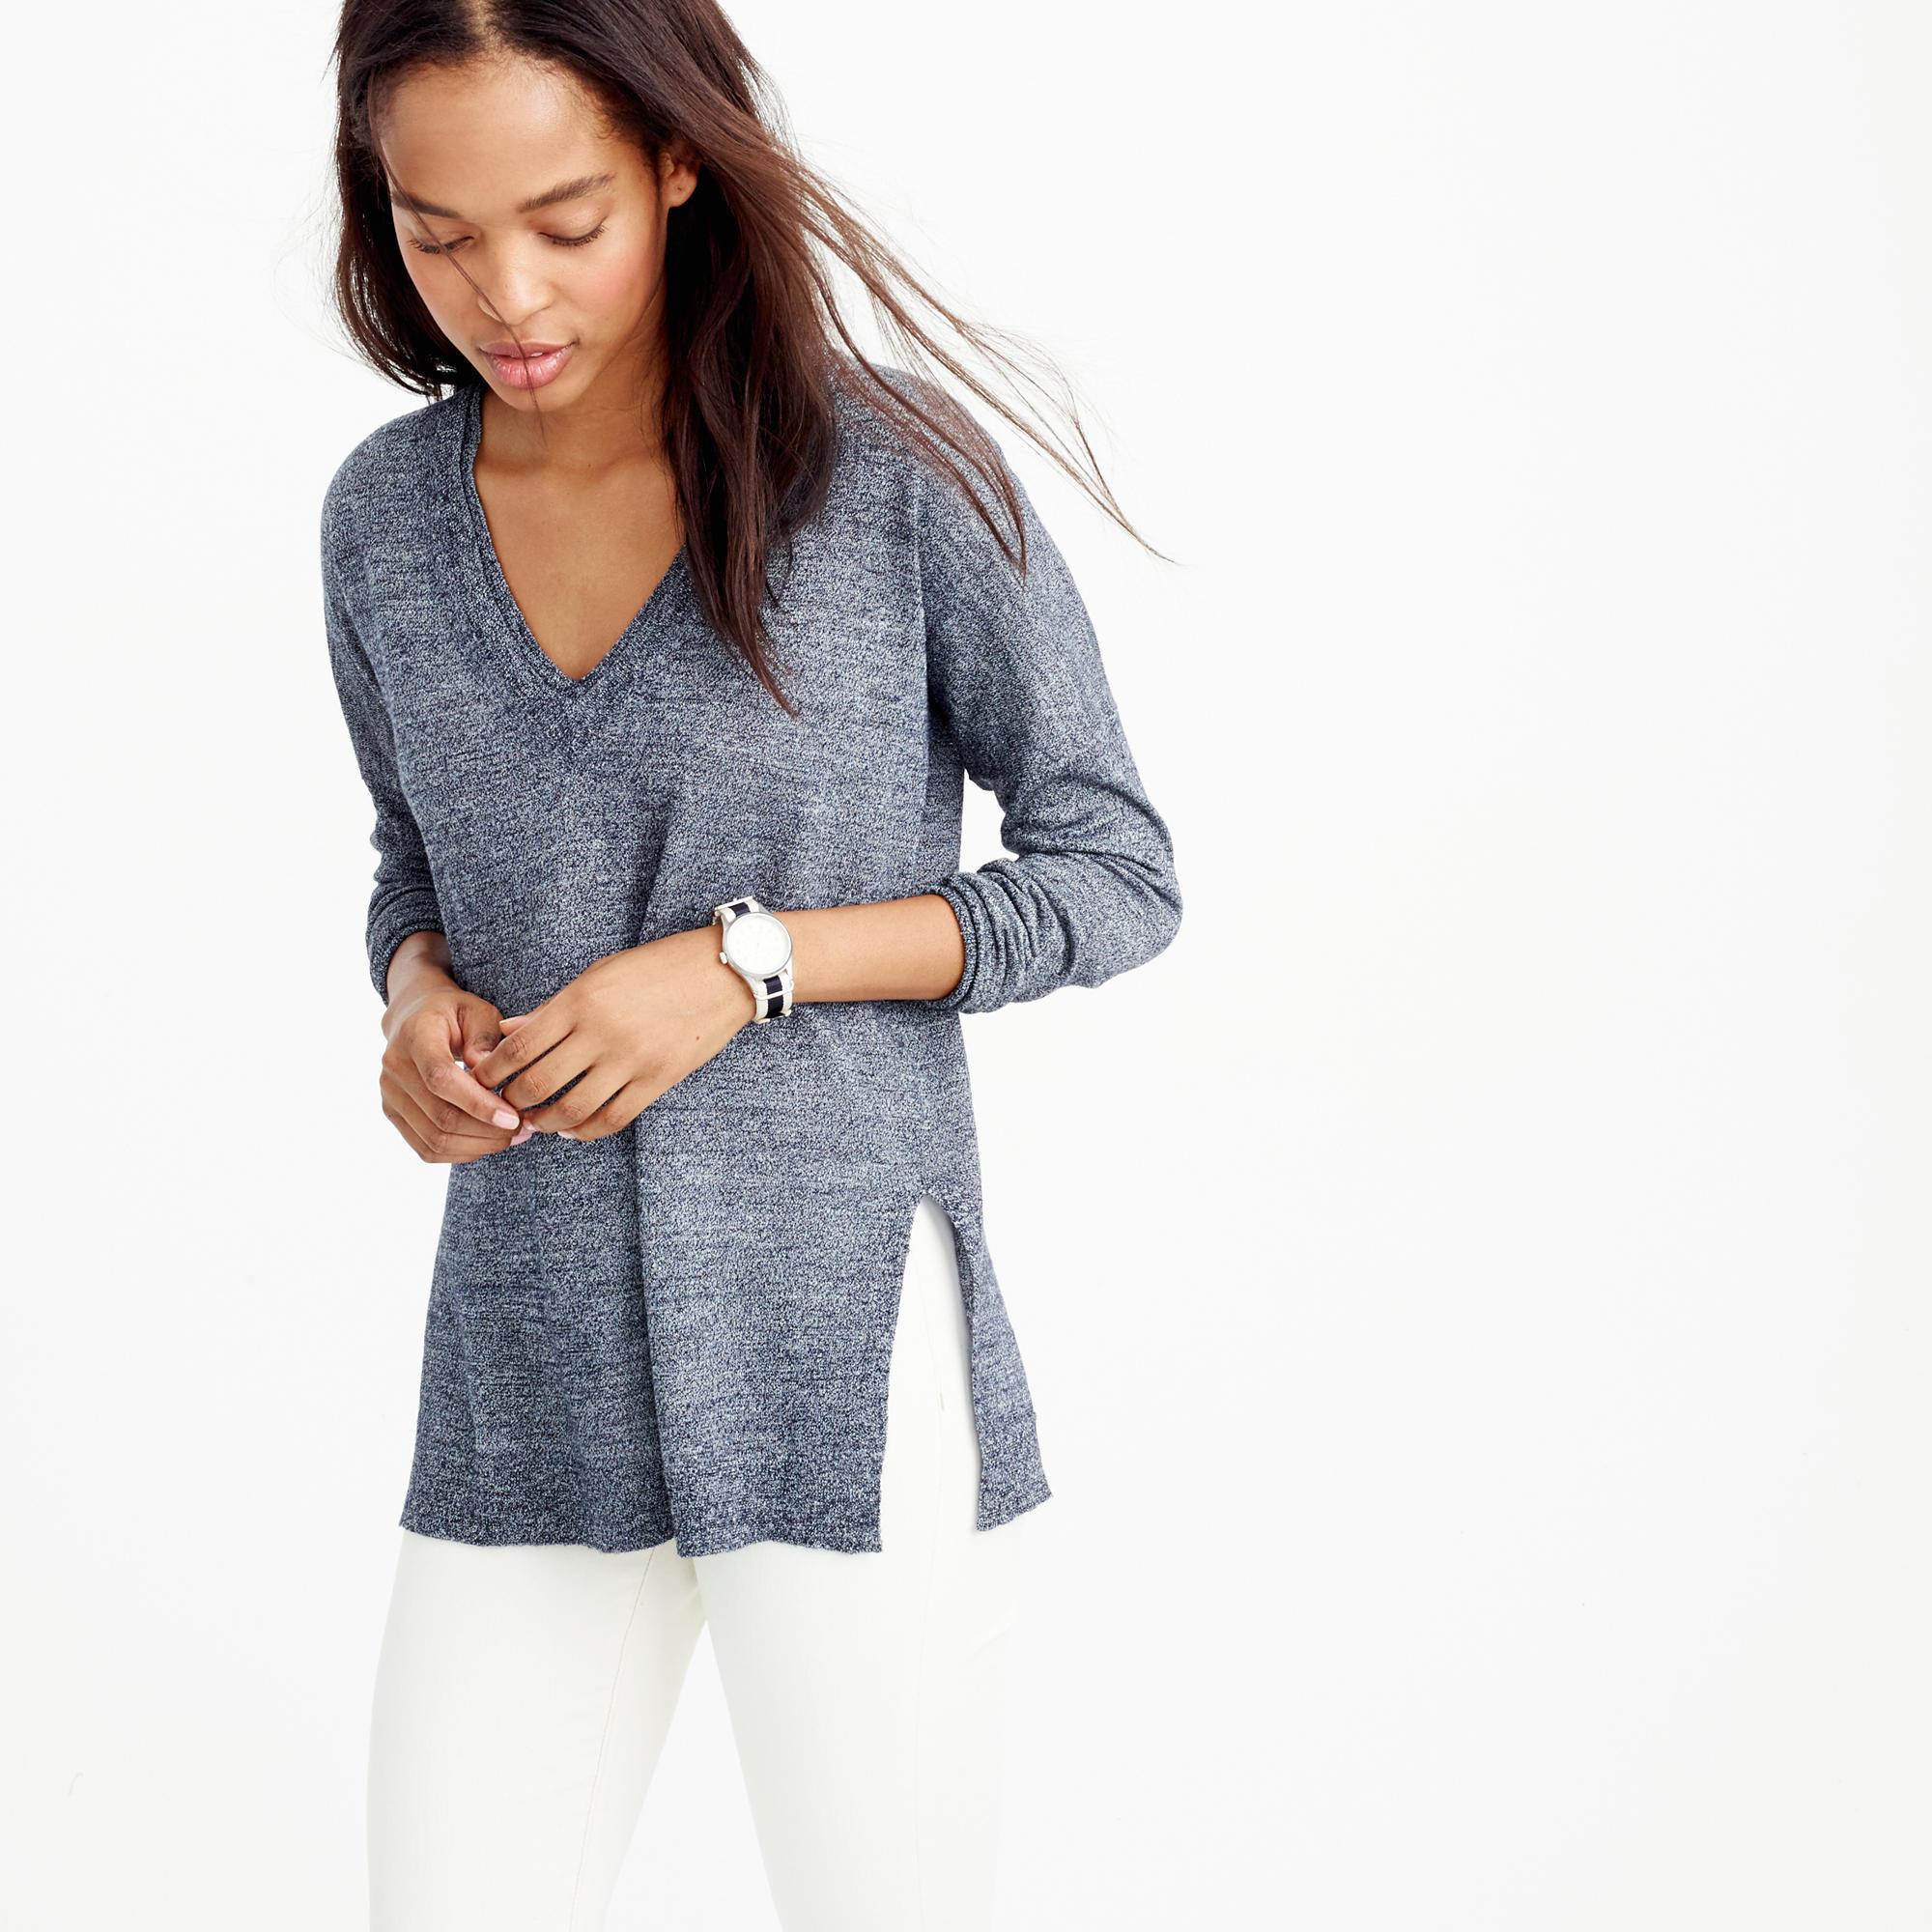 Lyst - J.Crew Merino-linen V-neck Sweater in Gray a545067e58